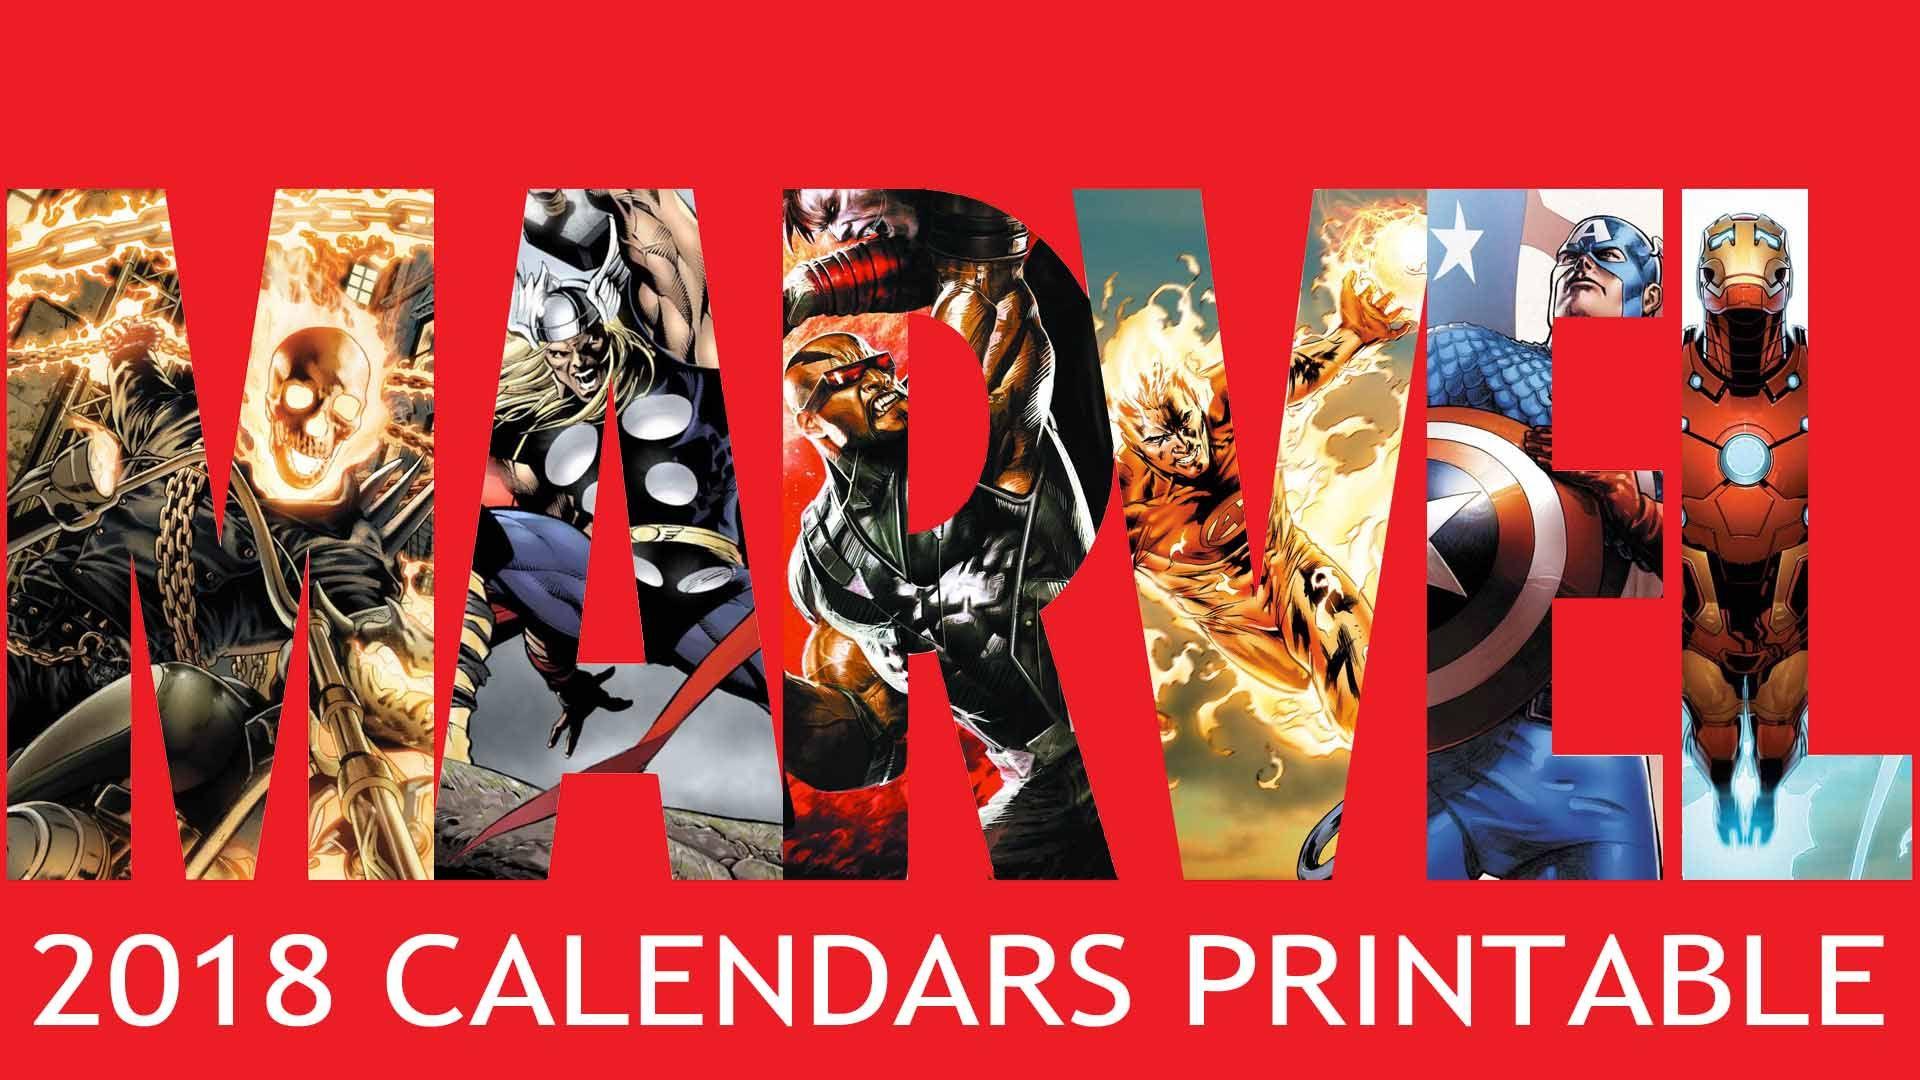 Wallpaper Calendar Superhero : Marvel calendars printable